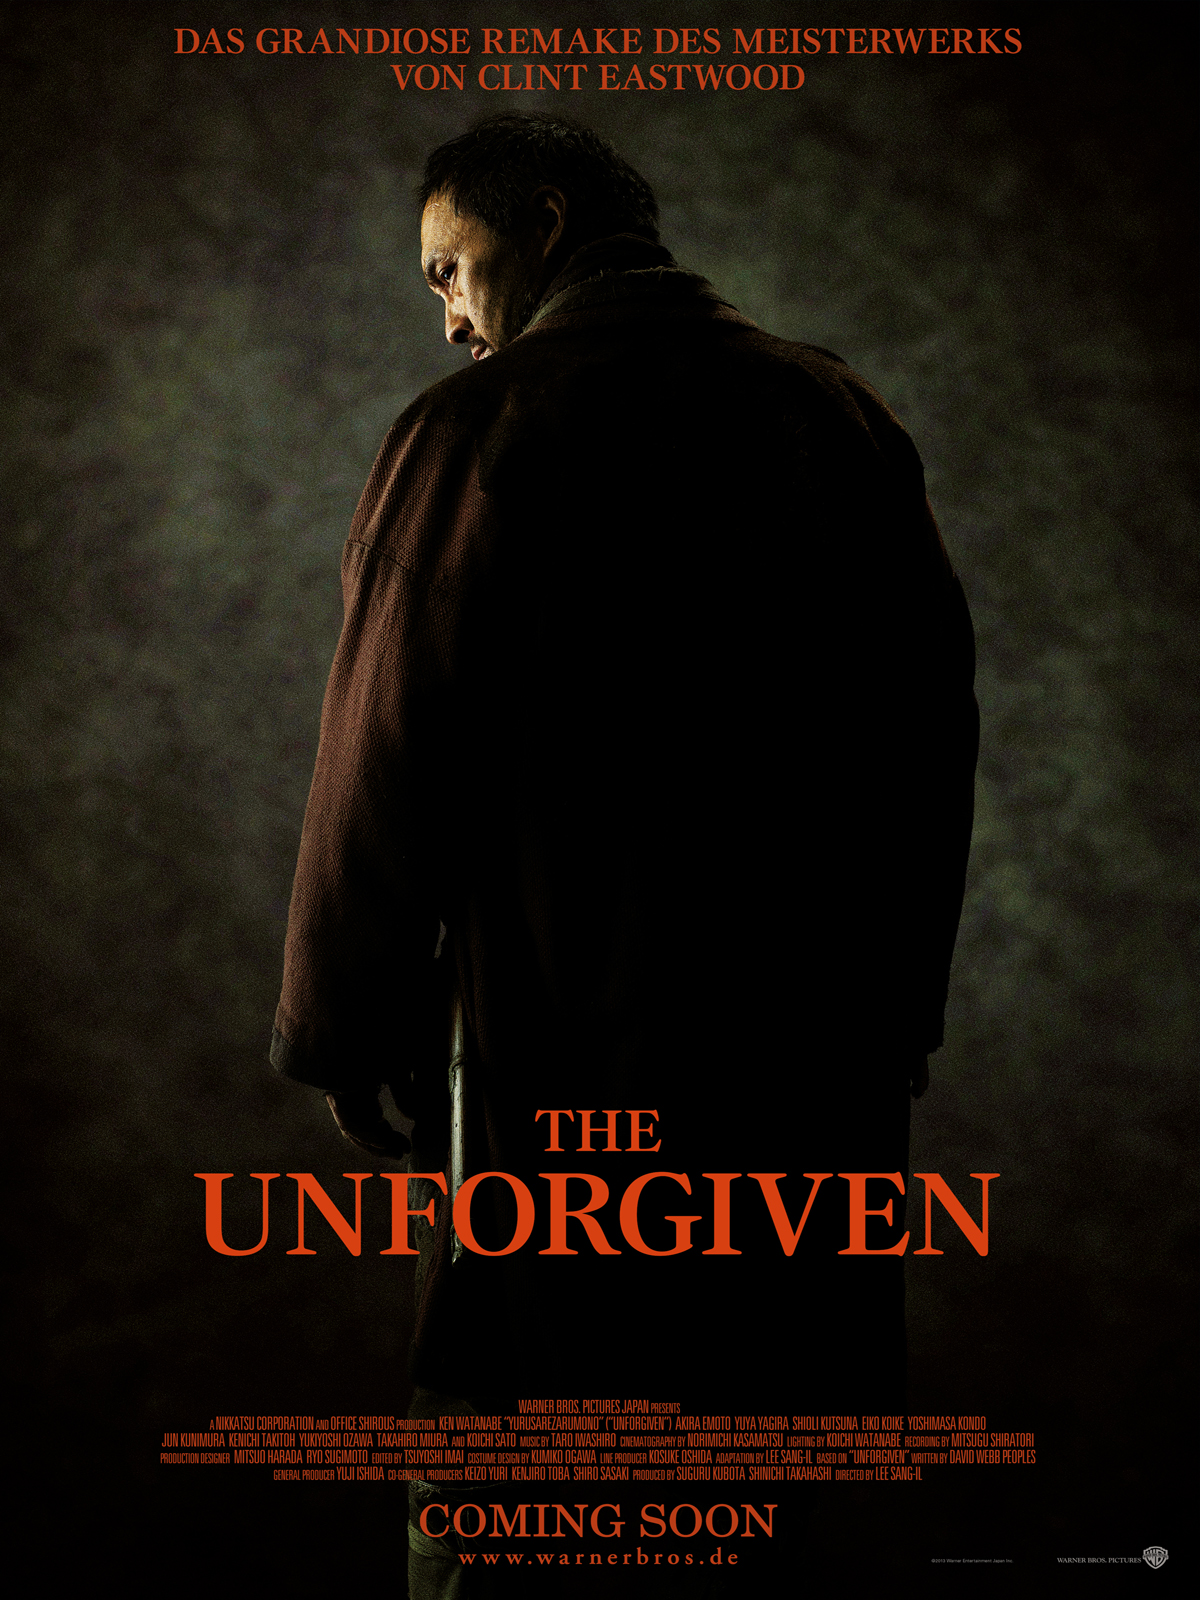 Unforgiven 2013